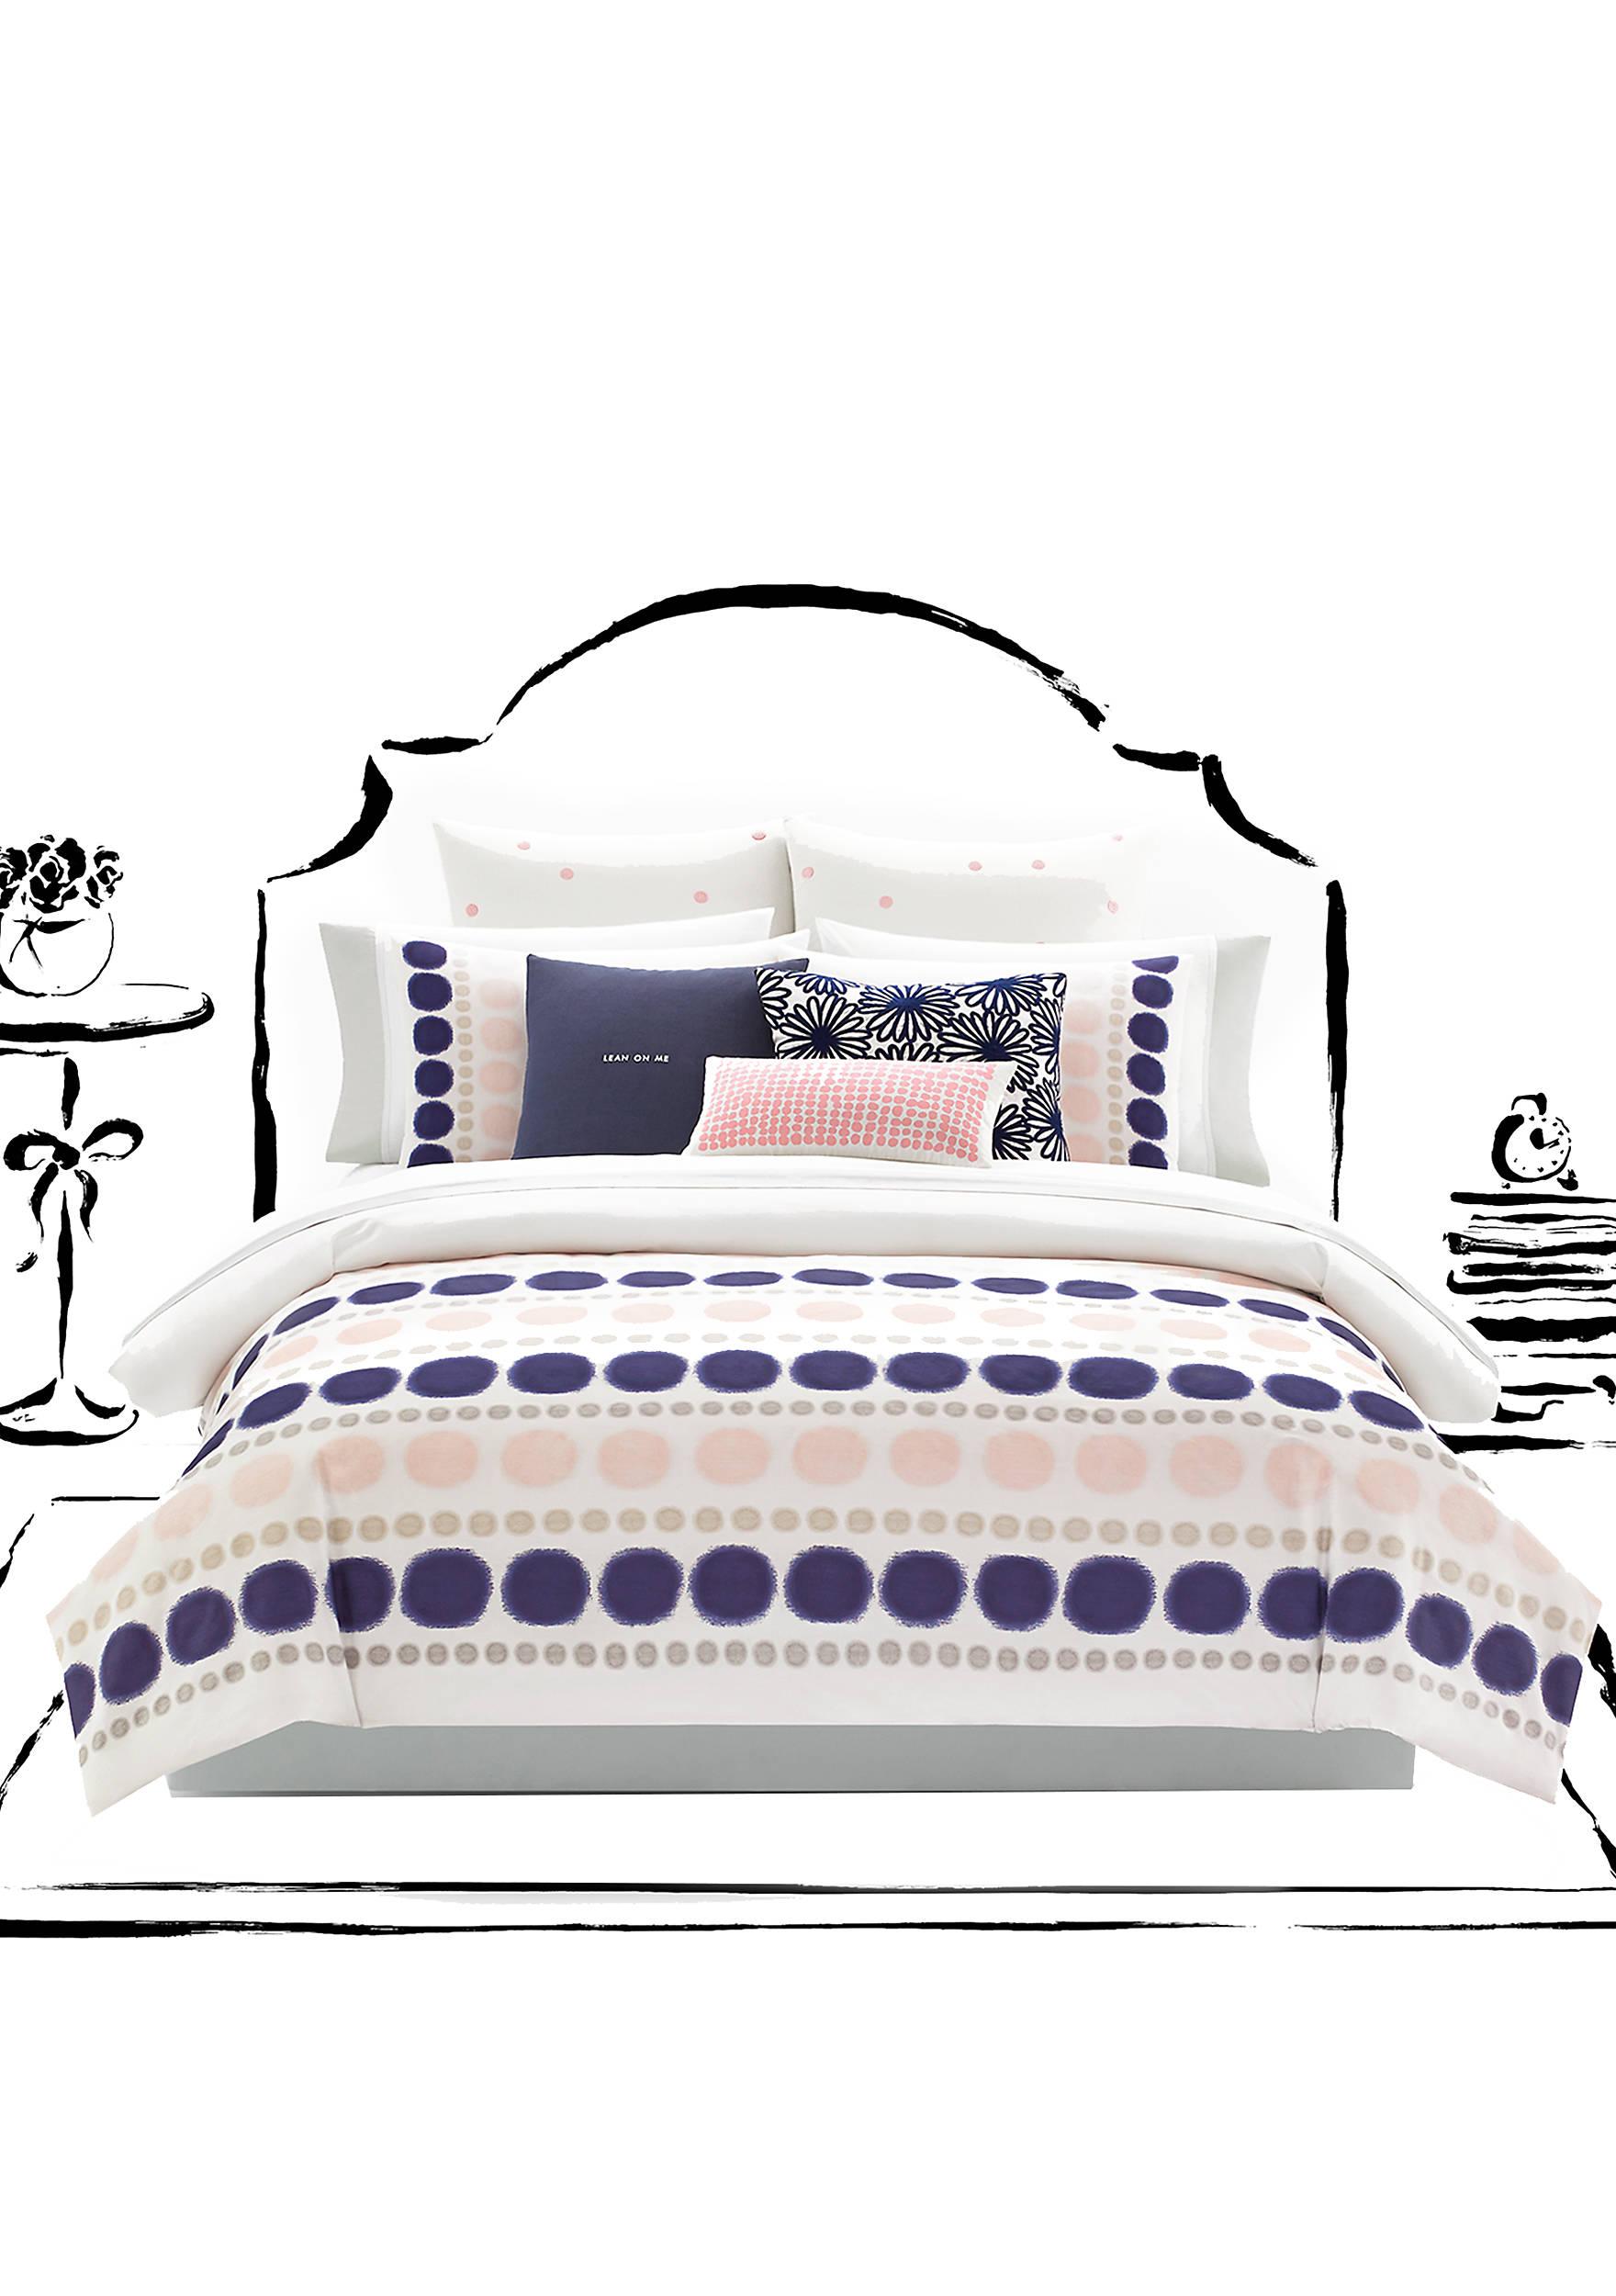 set home lush jaipur piece kitchen rust turquoise ikat full dp decor amazon com comforter queen